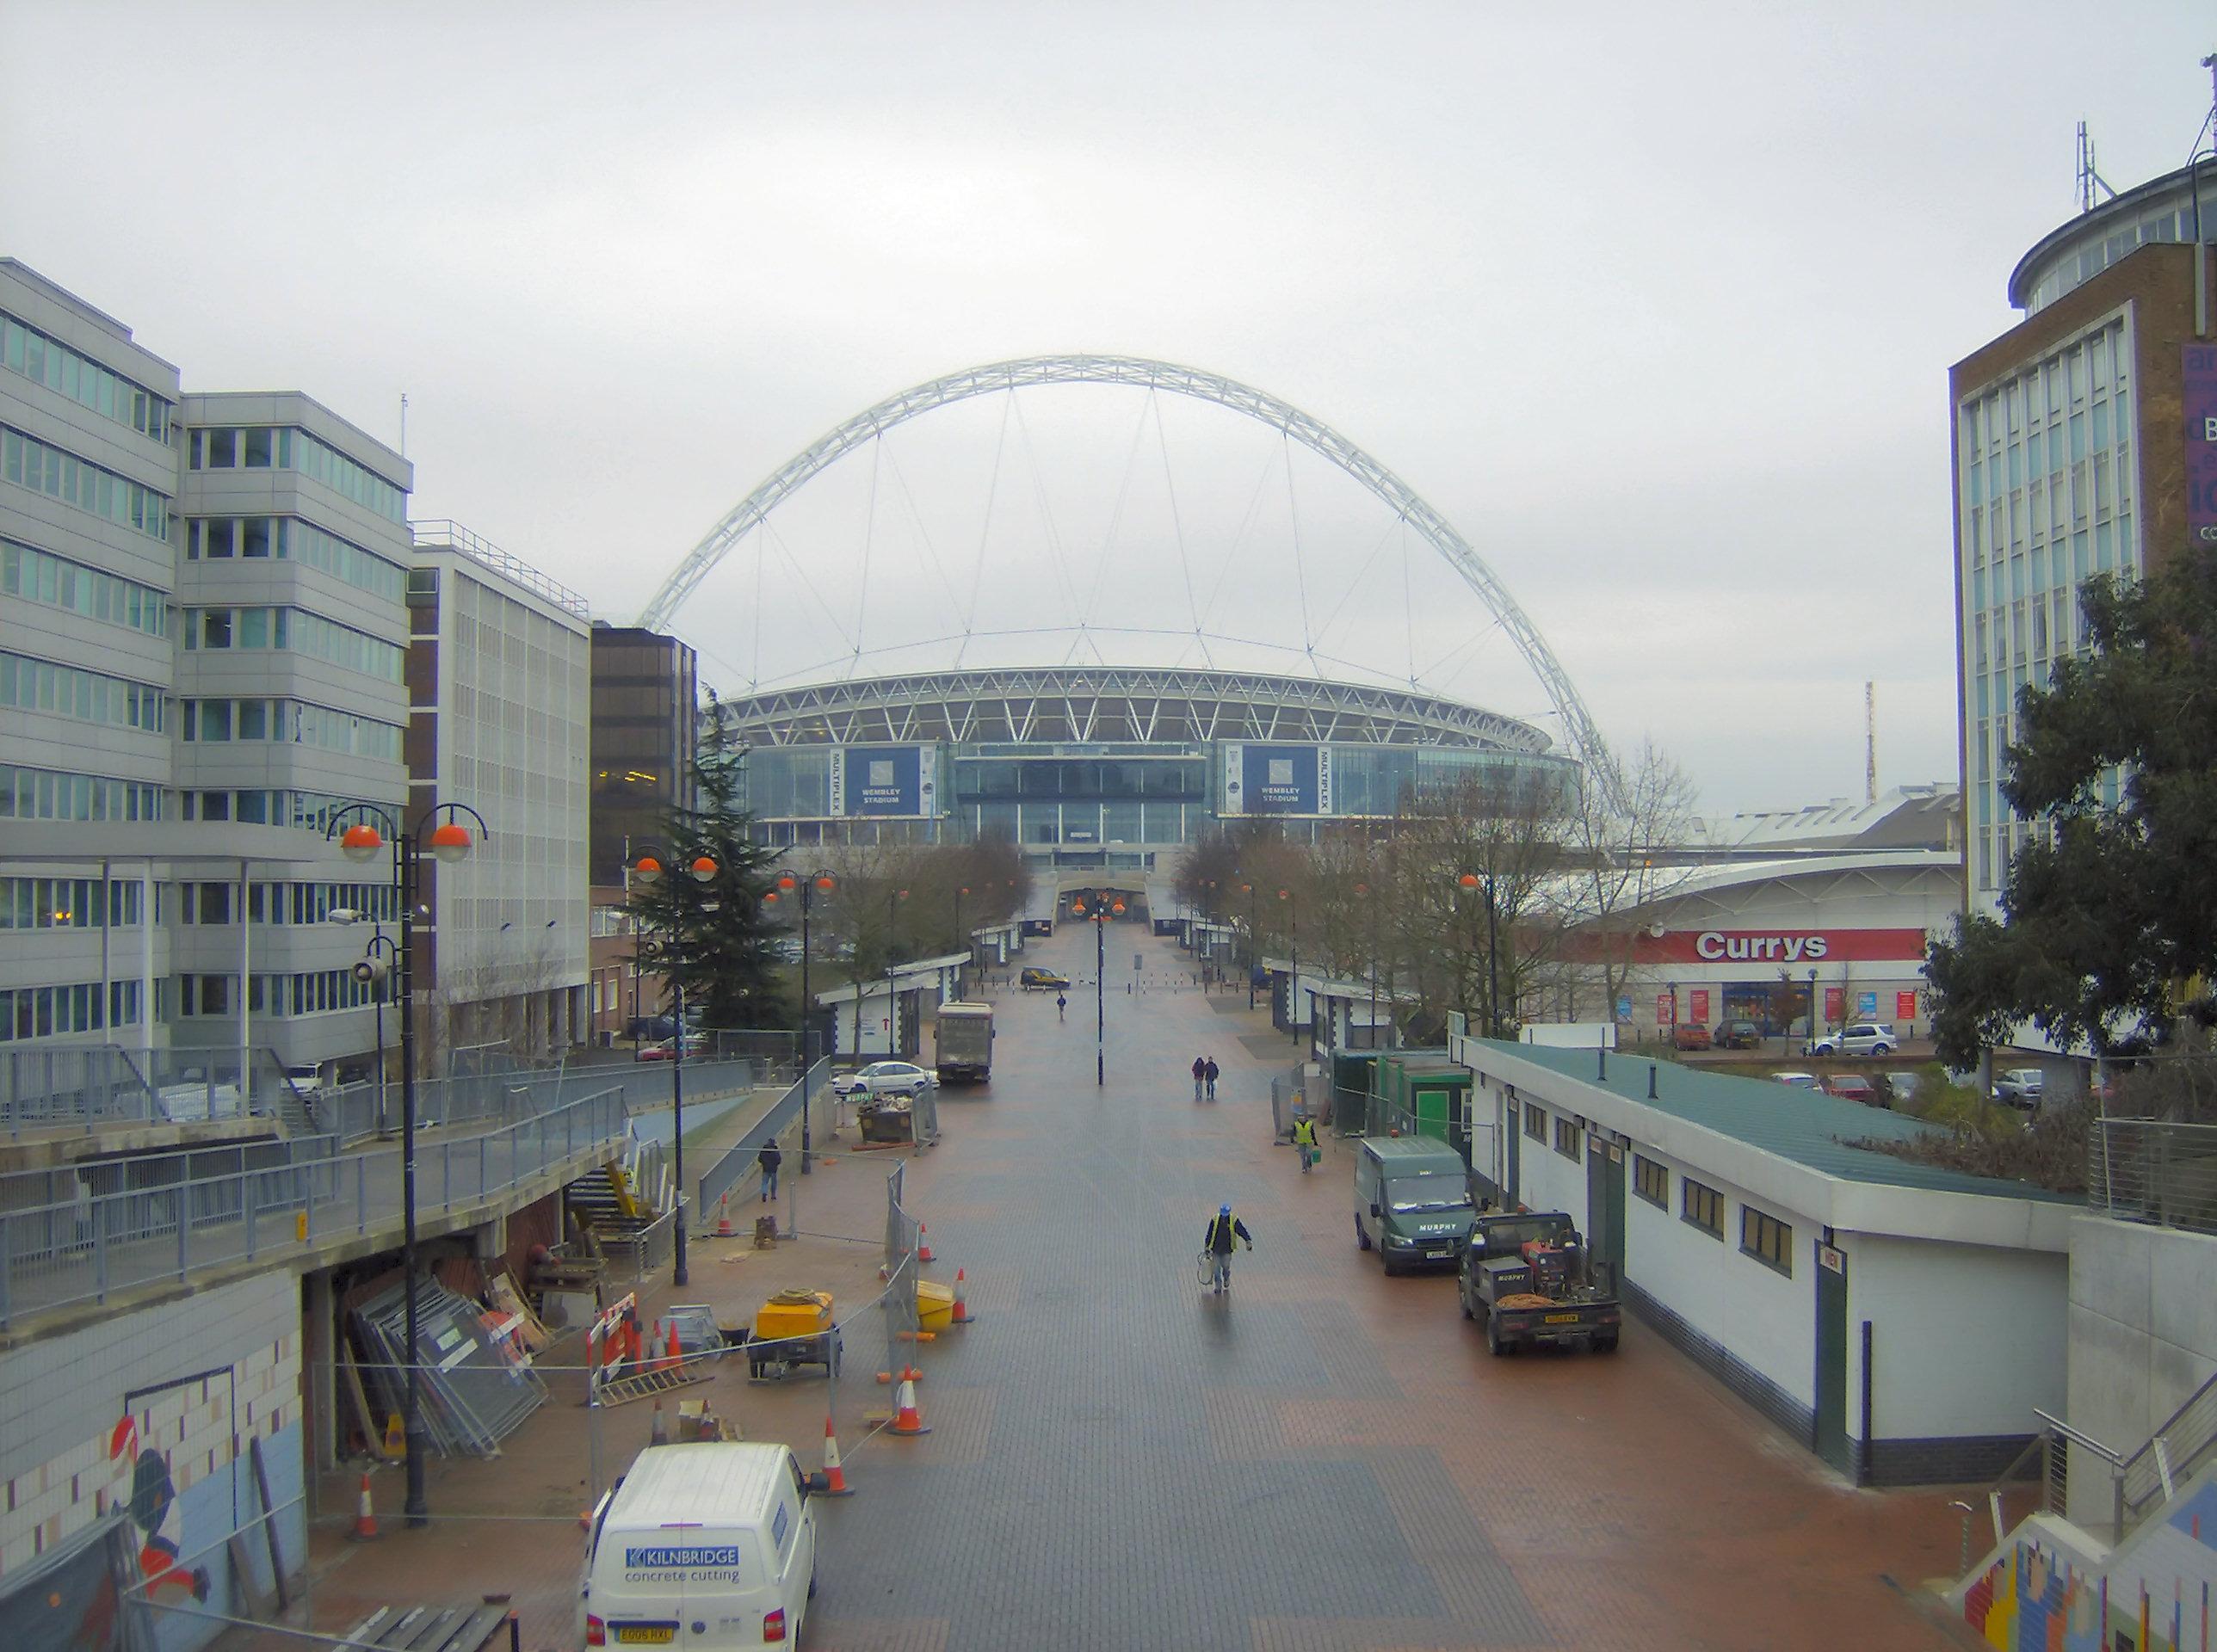 Wembley_Stadium_down_Wembley_Way